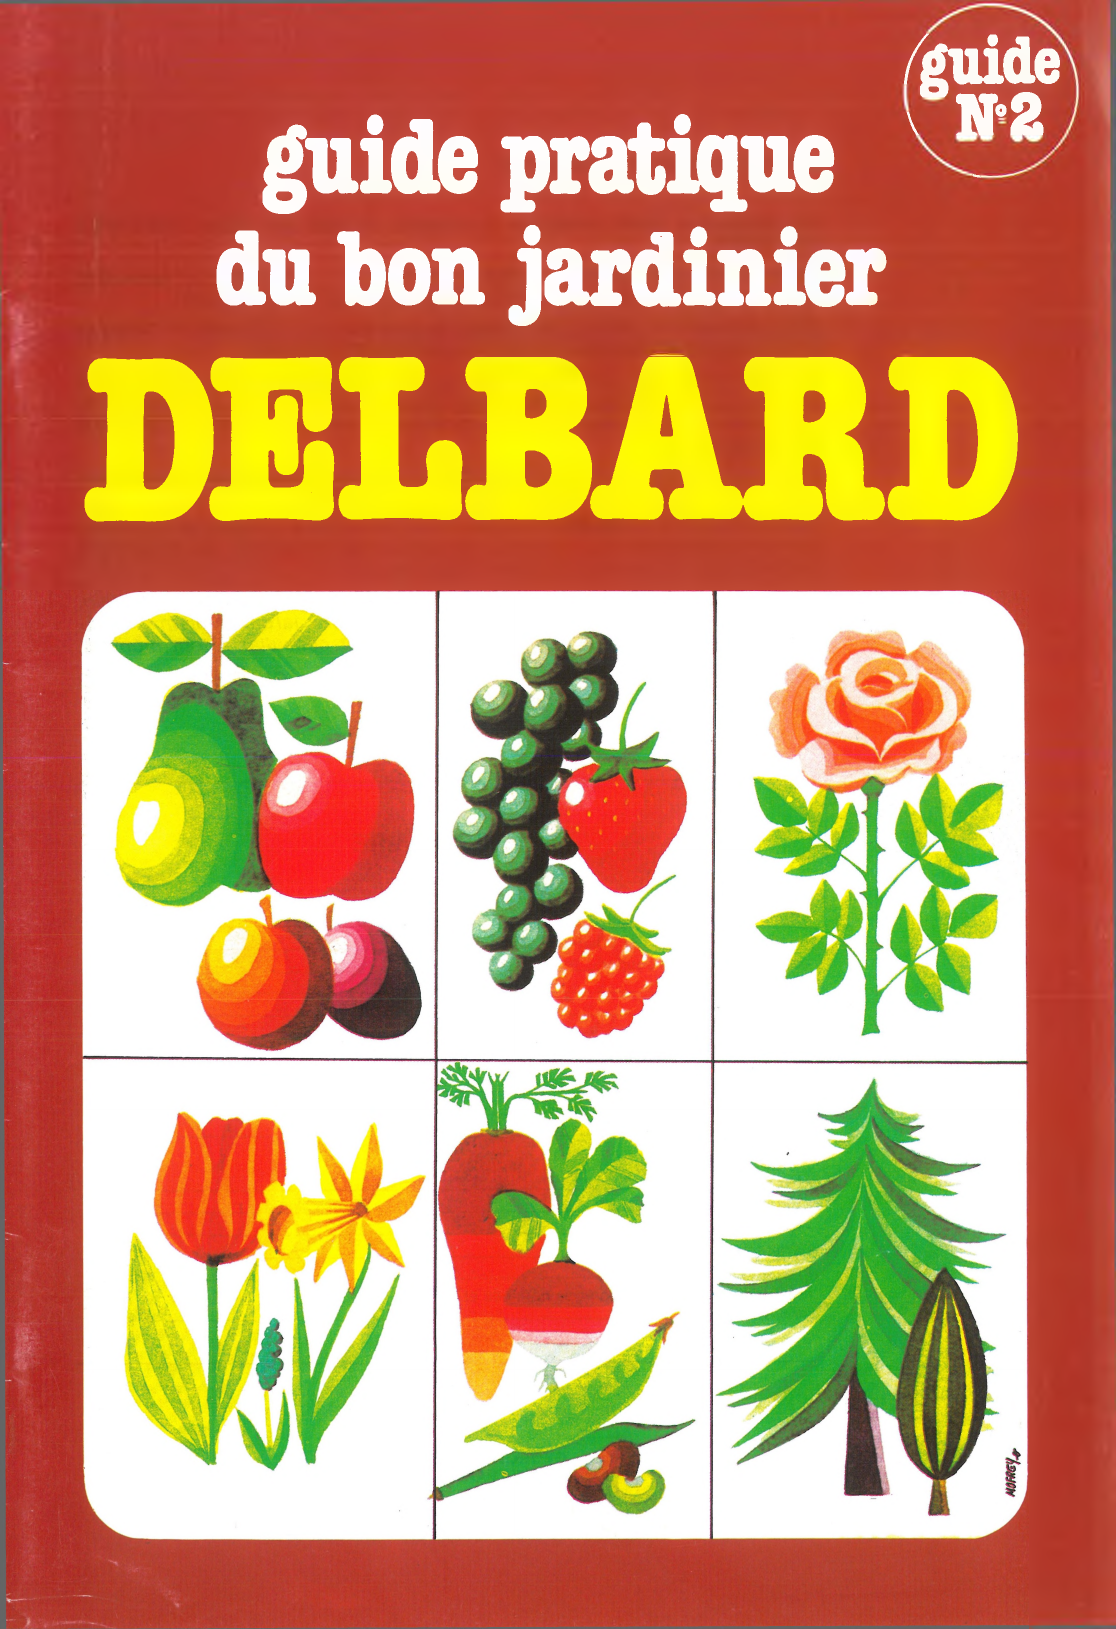 Guide Bon Jardinier Du Delbard Pratique odBrCxe